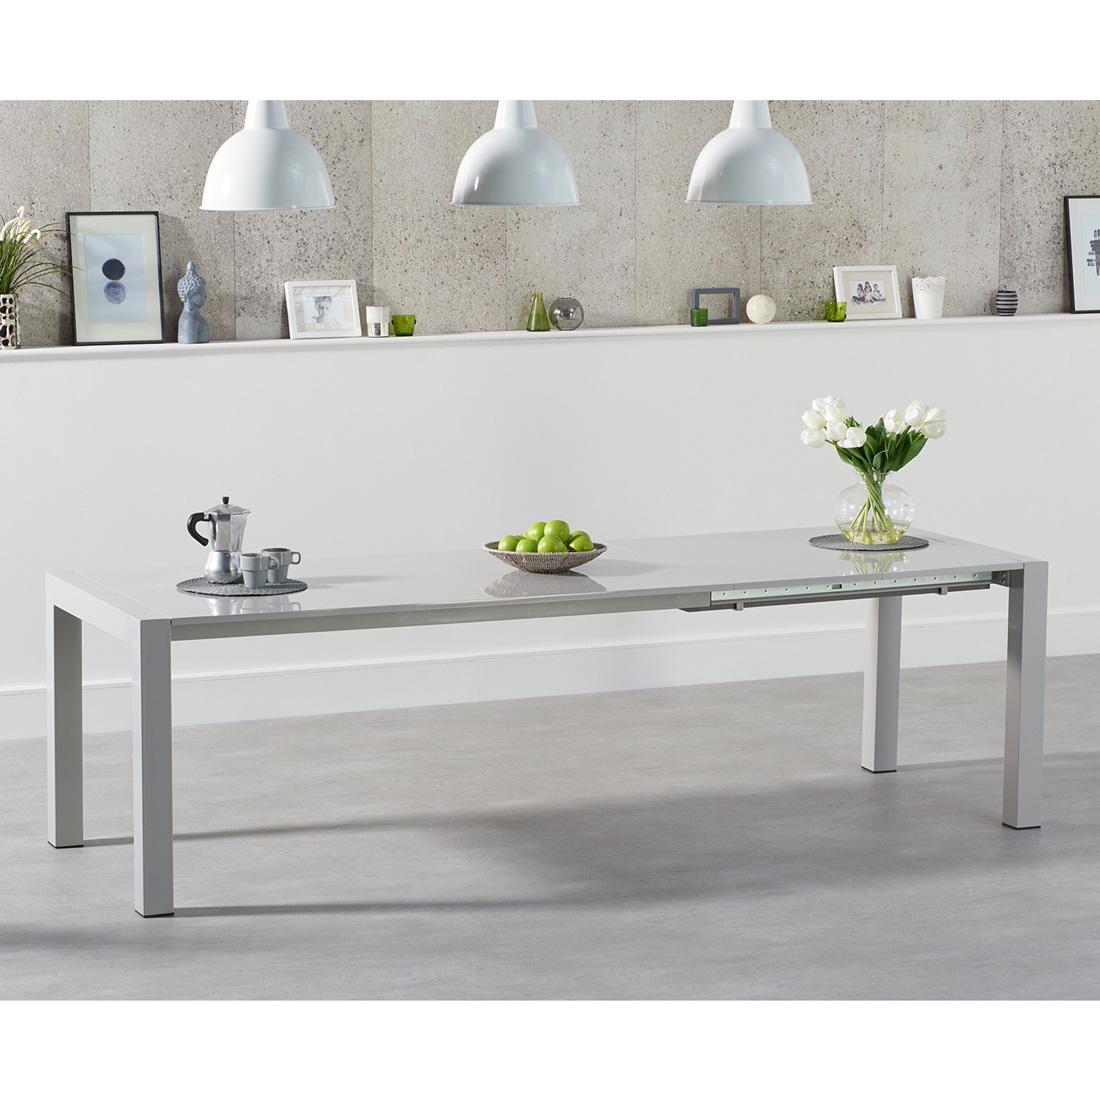 Jamie Extending Rectangular Dining Table Light Grey Gloss - 6 to 10 seat